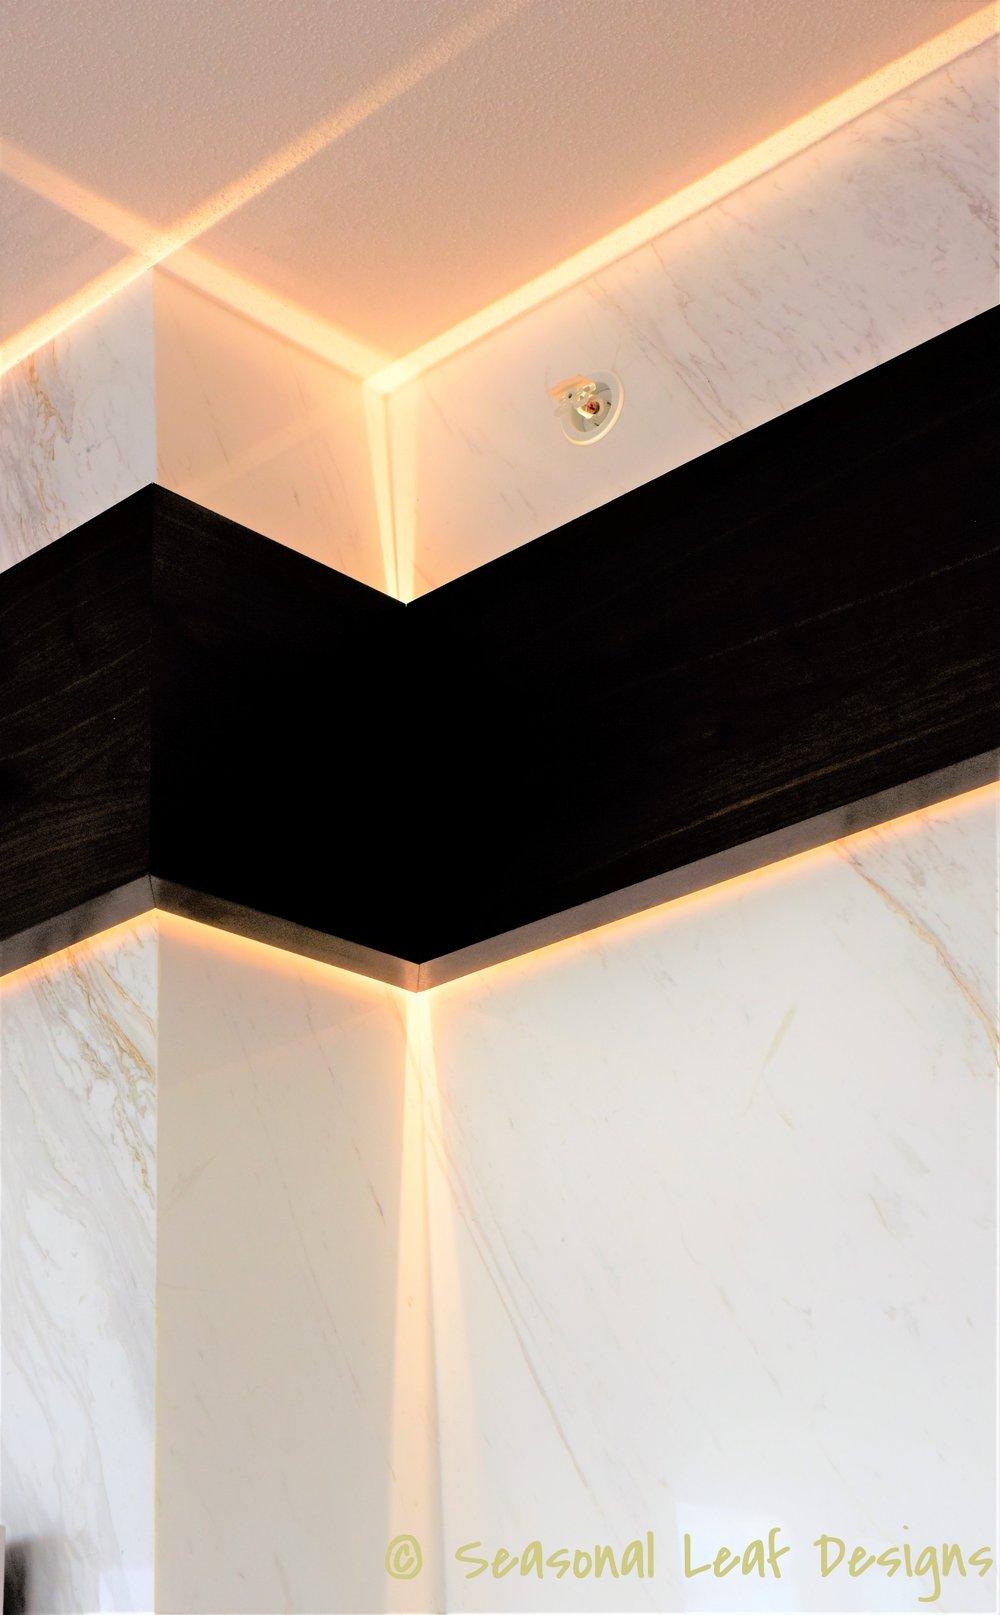 Walnut Panel Cove Lighting SLD6.JPG